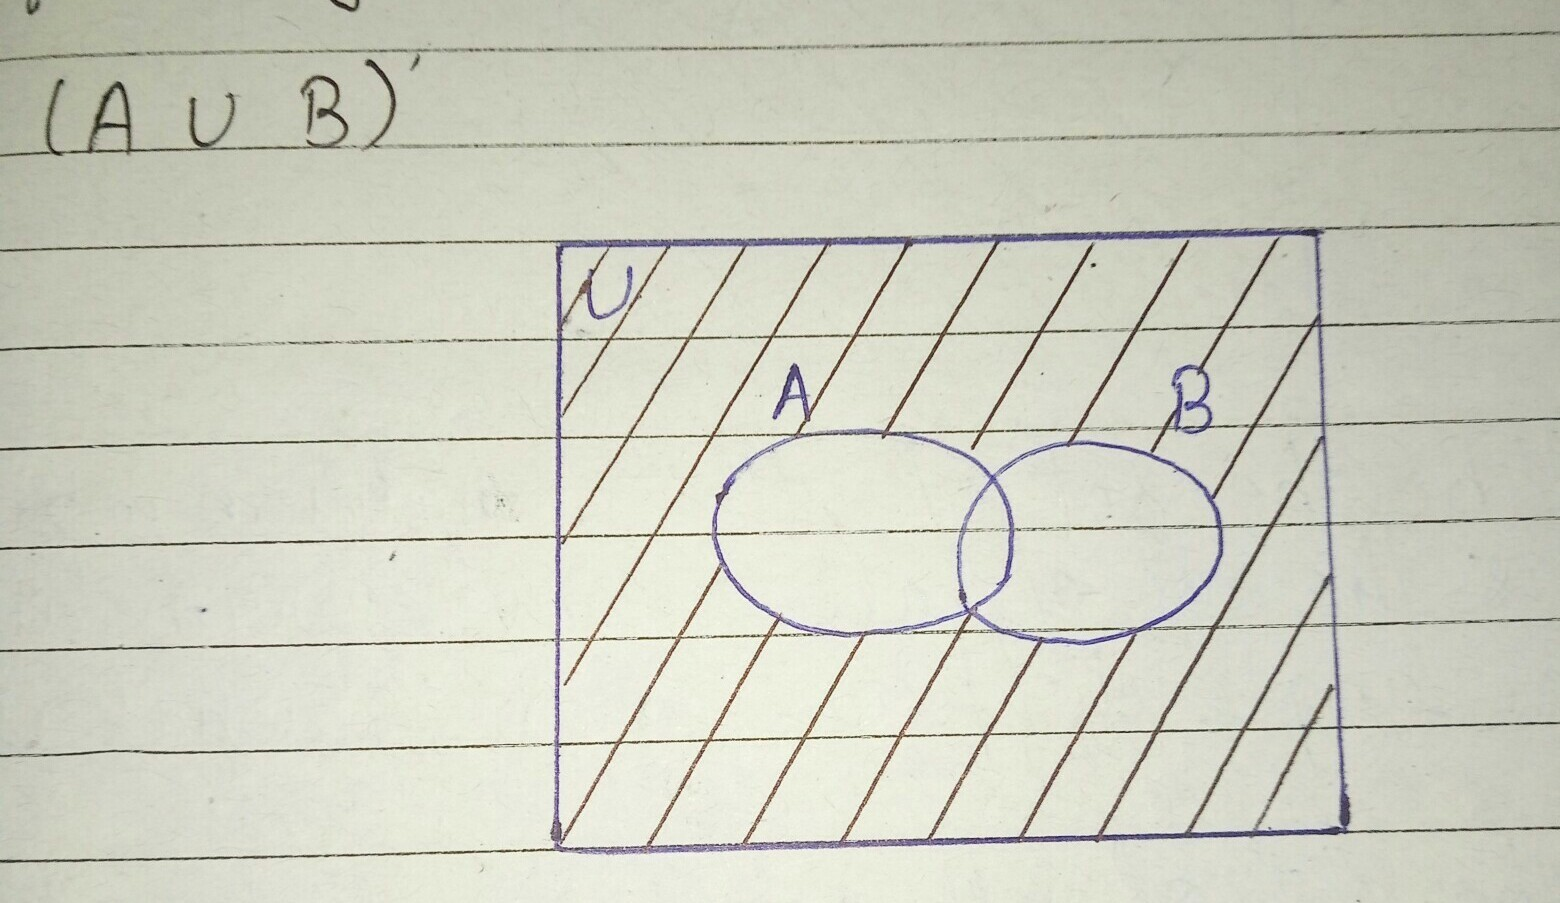 Draw Appropriate Venn Diagram Aub A Ub Brainly In